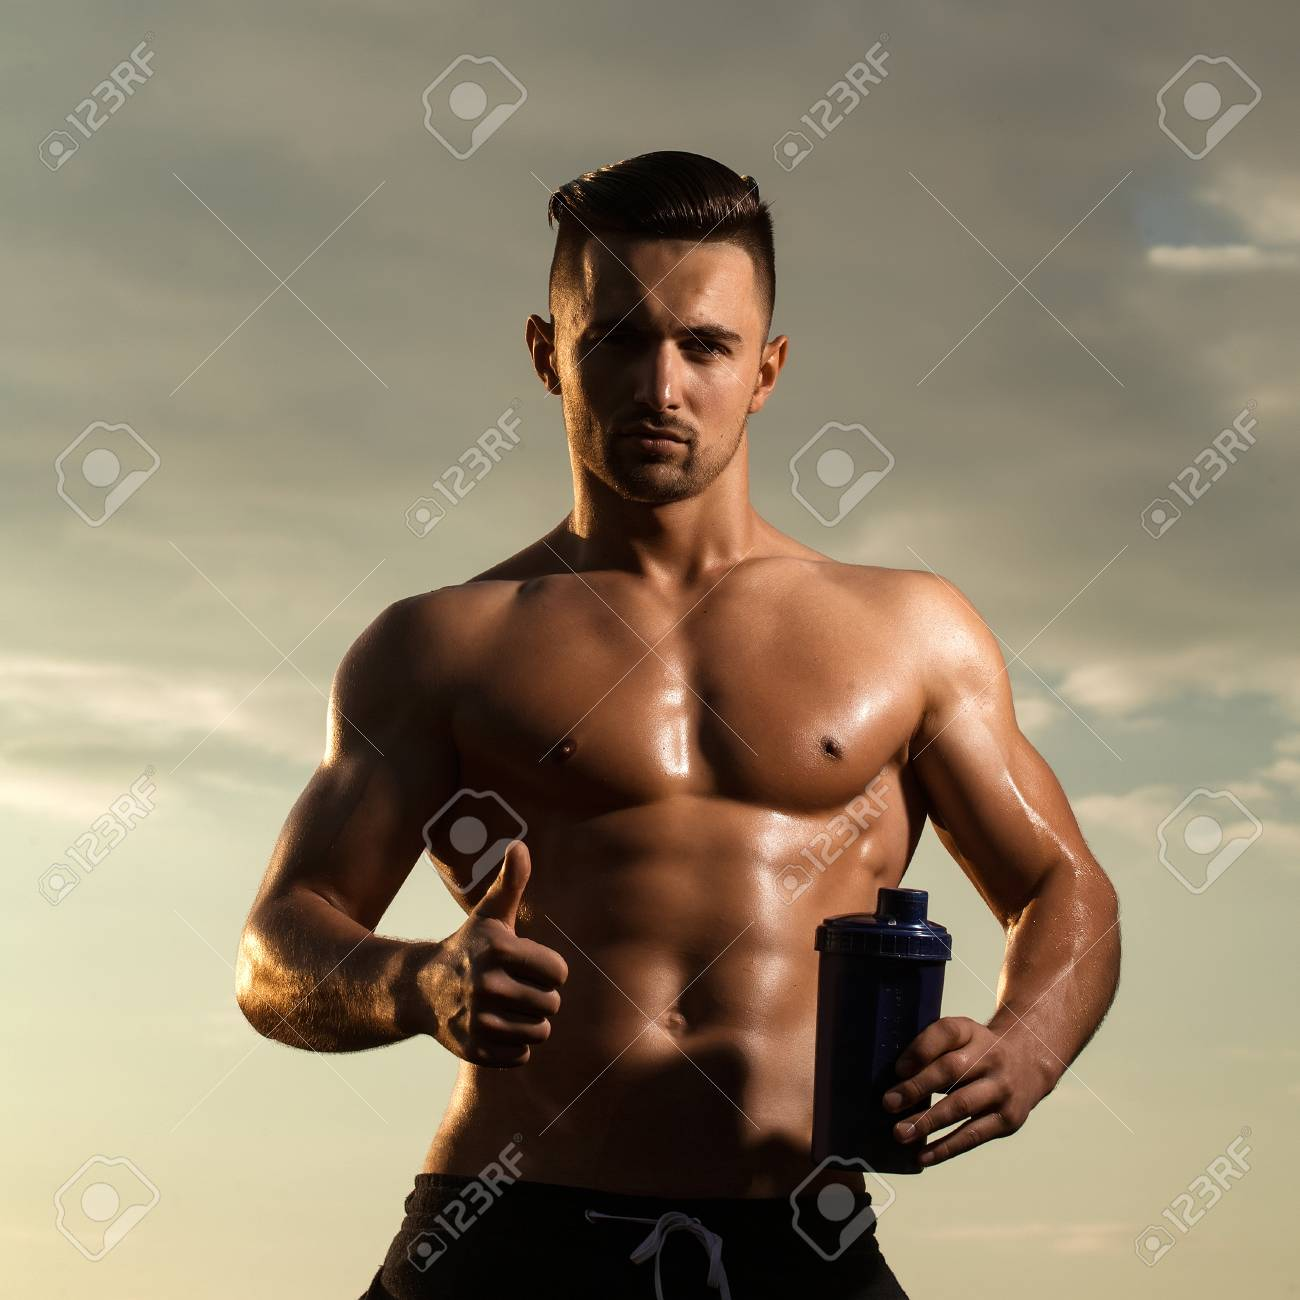 Junge nackt sport foto pic 95